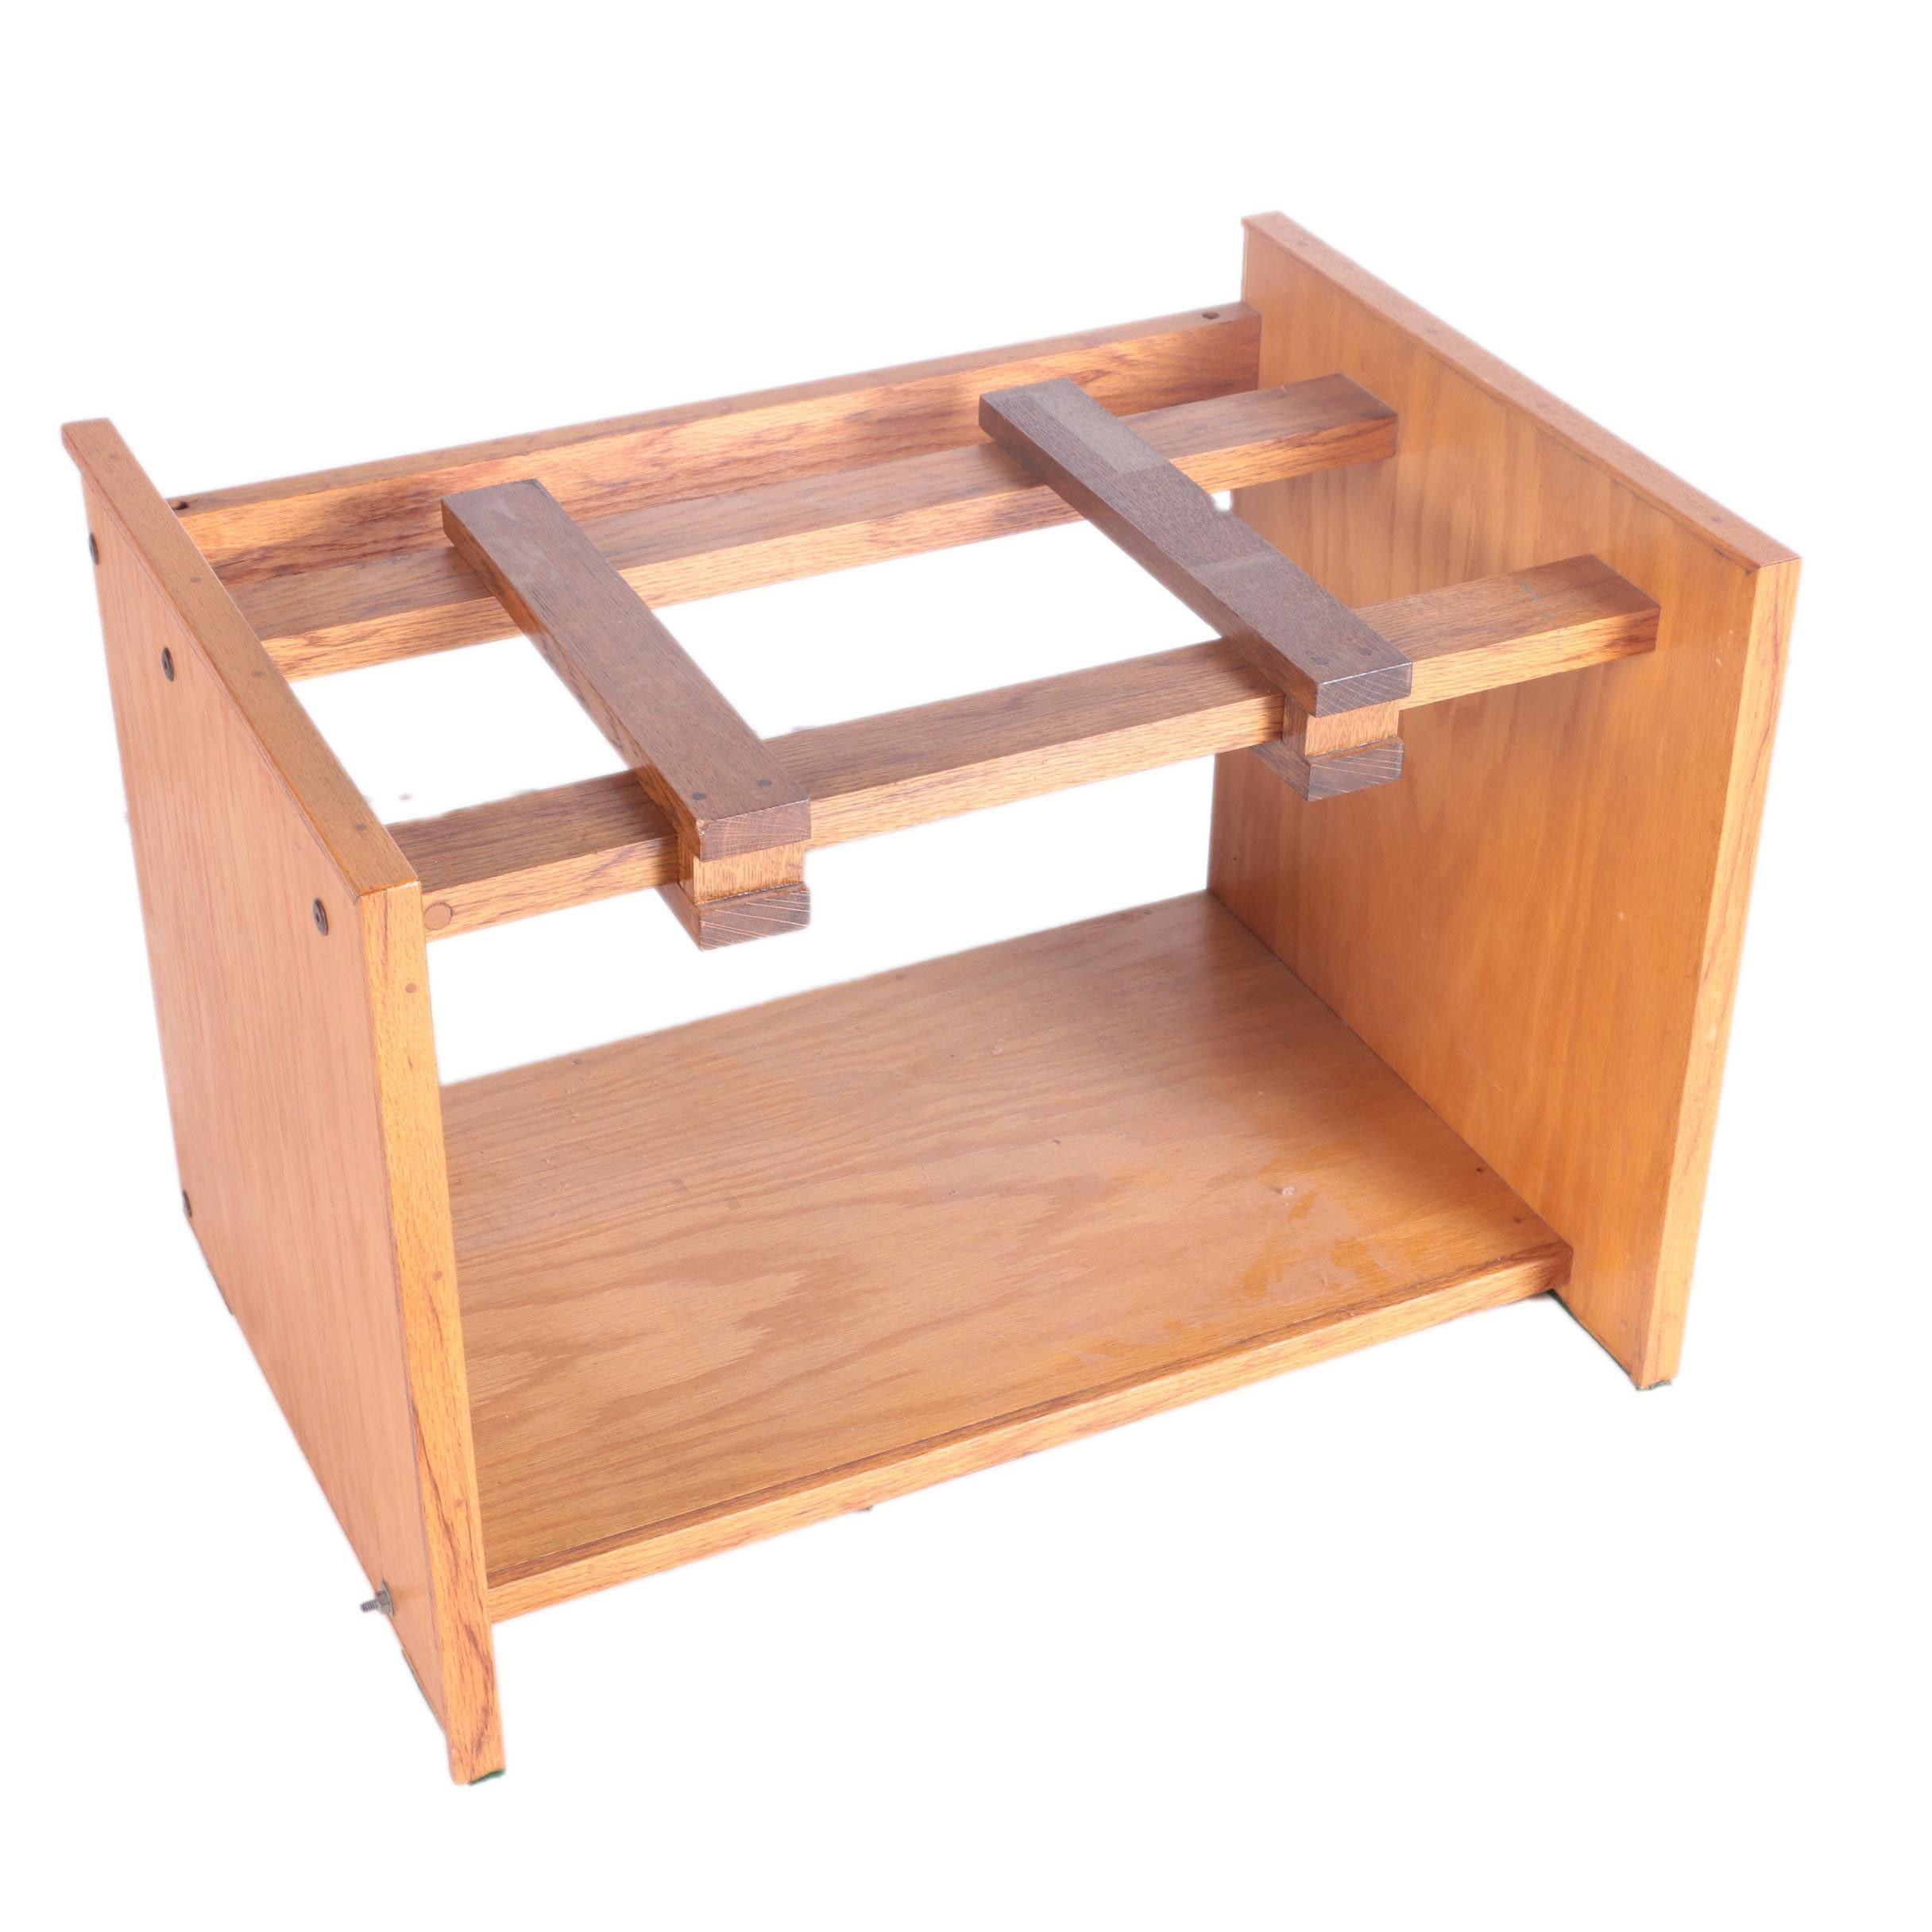 Minimalist Wooden Television Stand